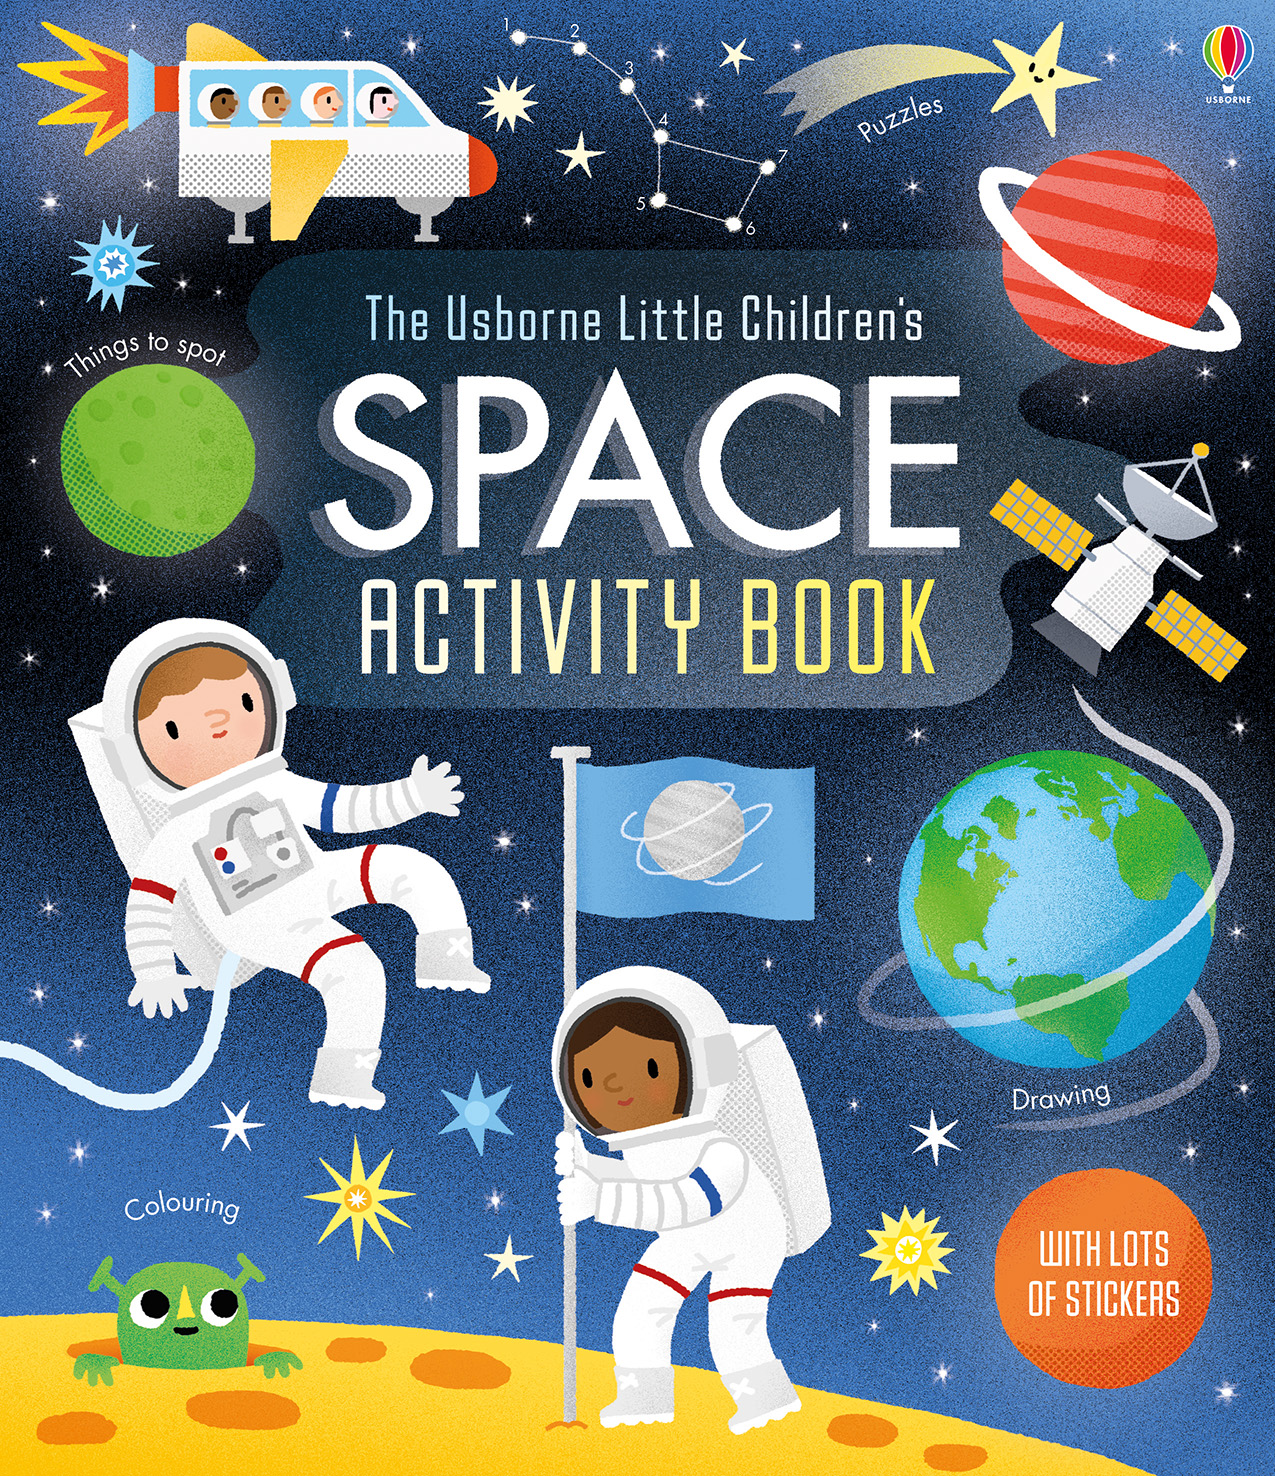 Little children's SPACE activity book low res.jpg